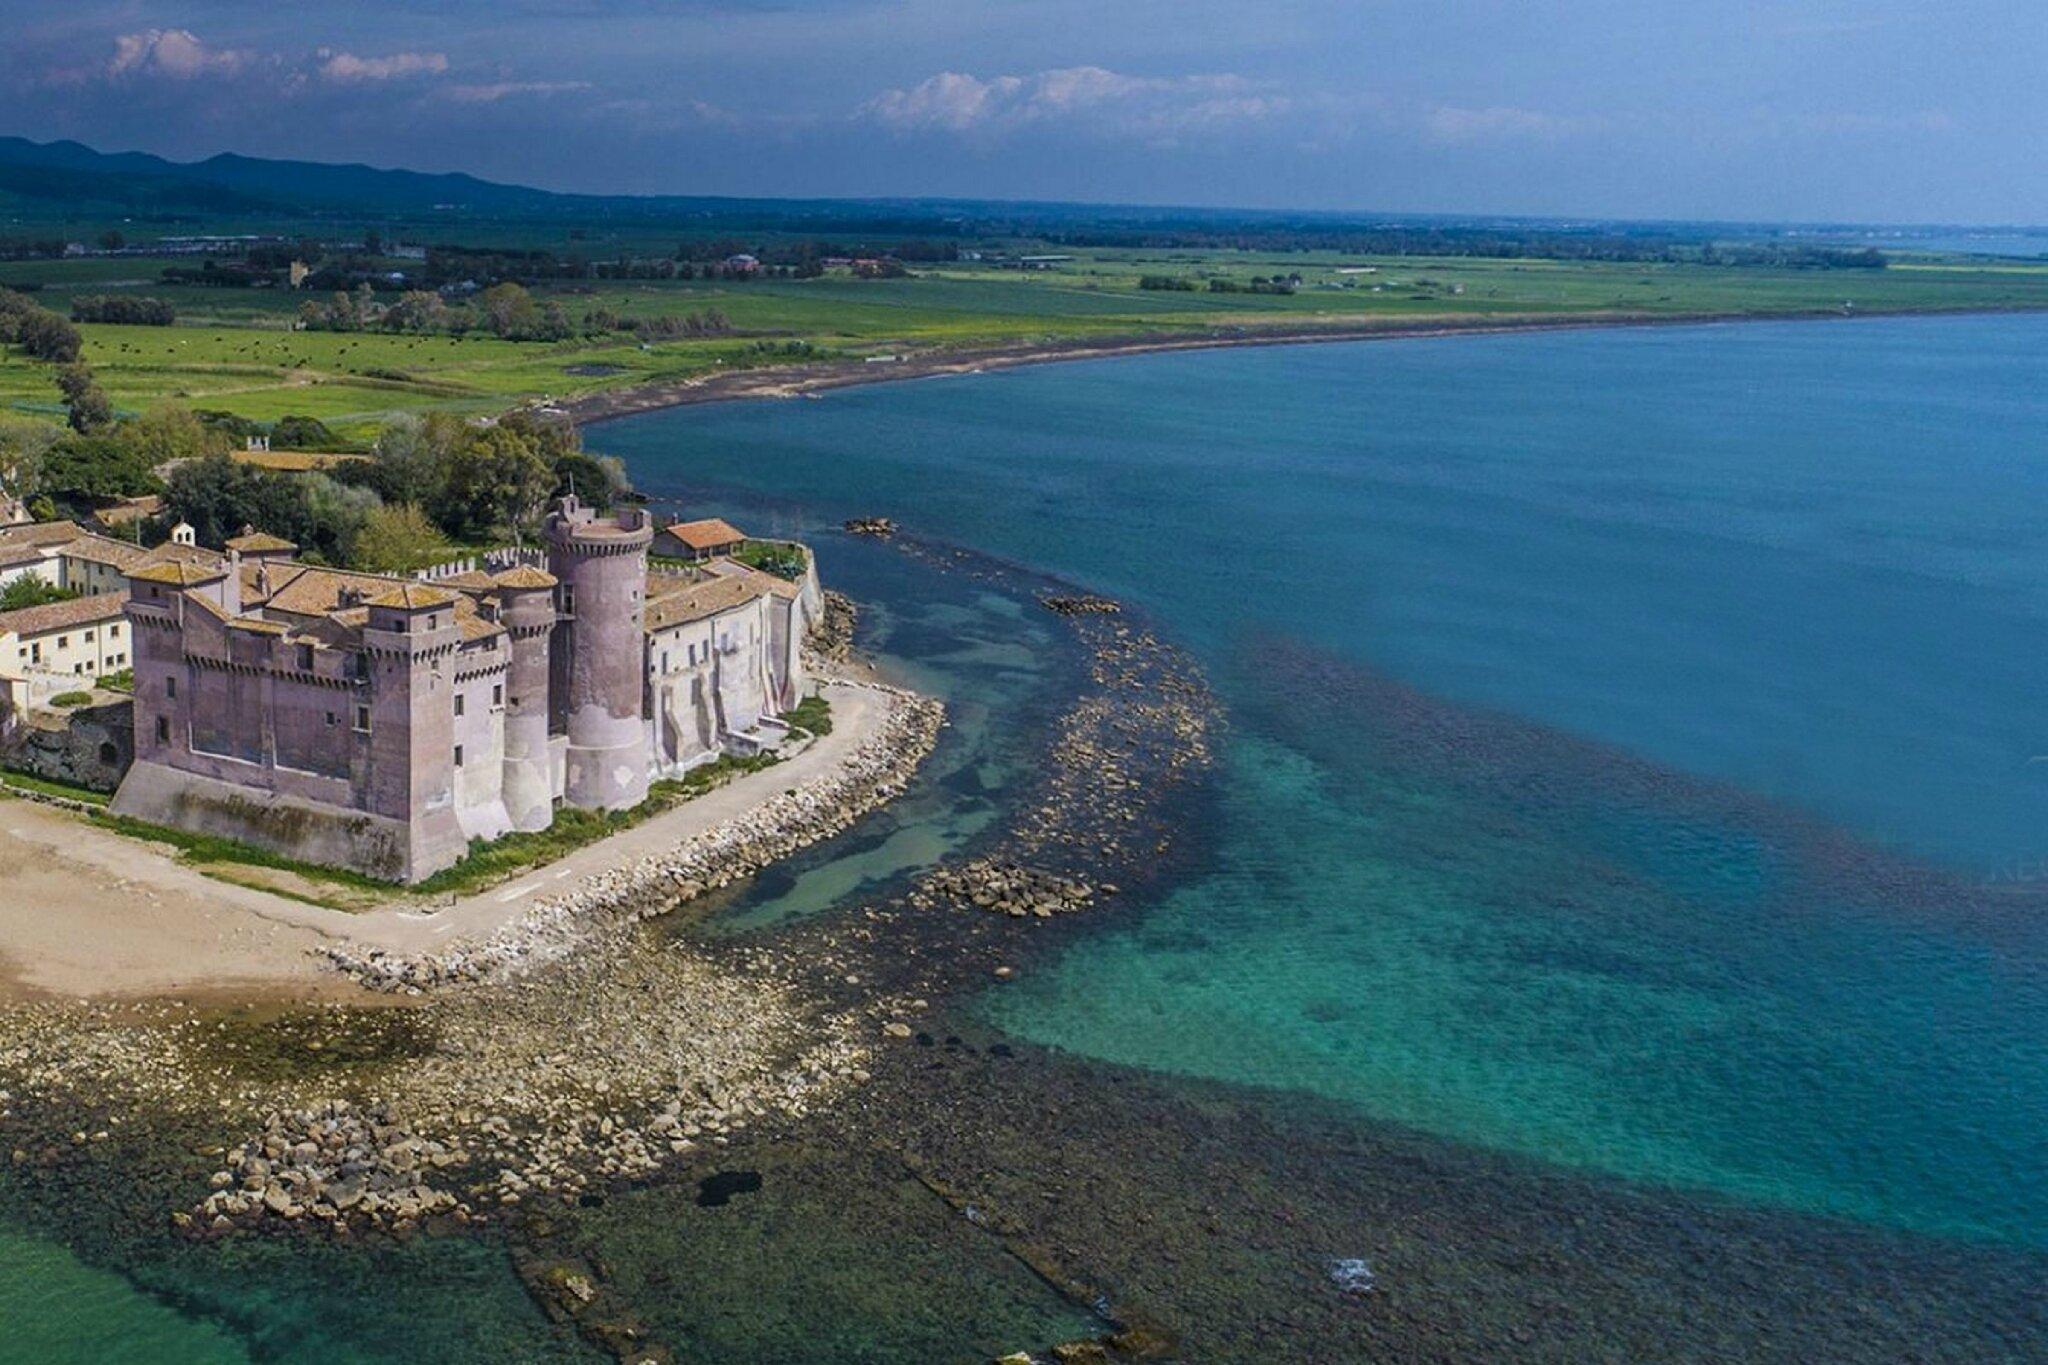 Le château de Santa Severa